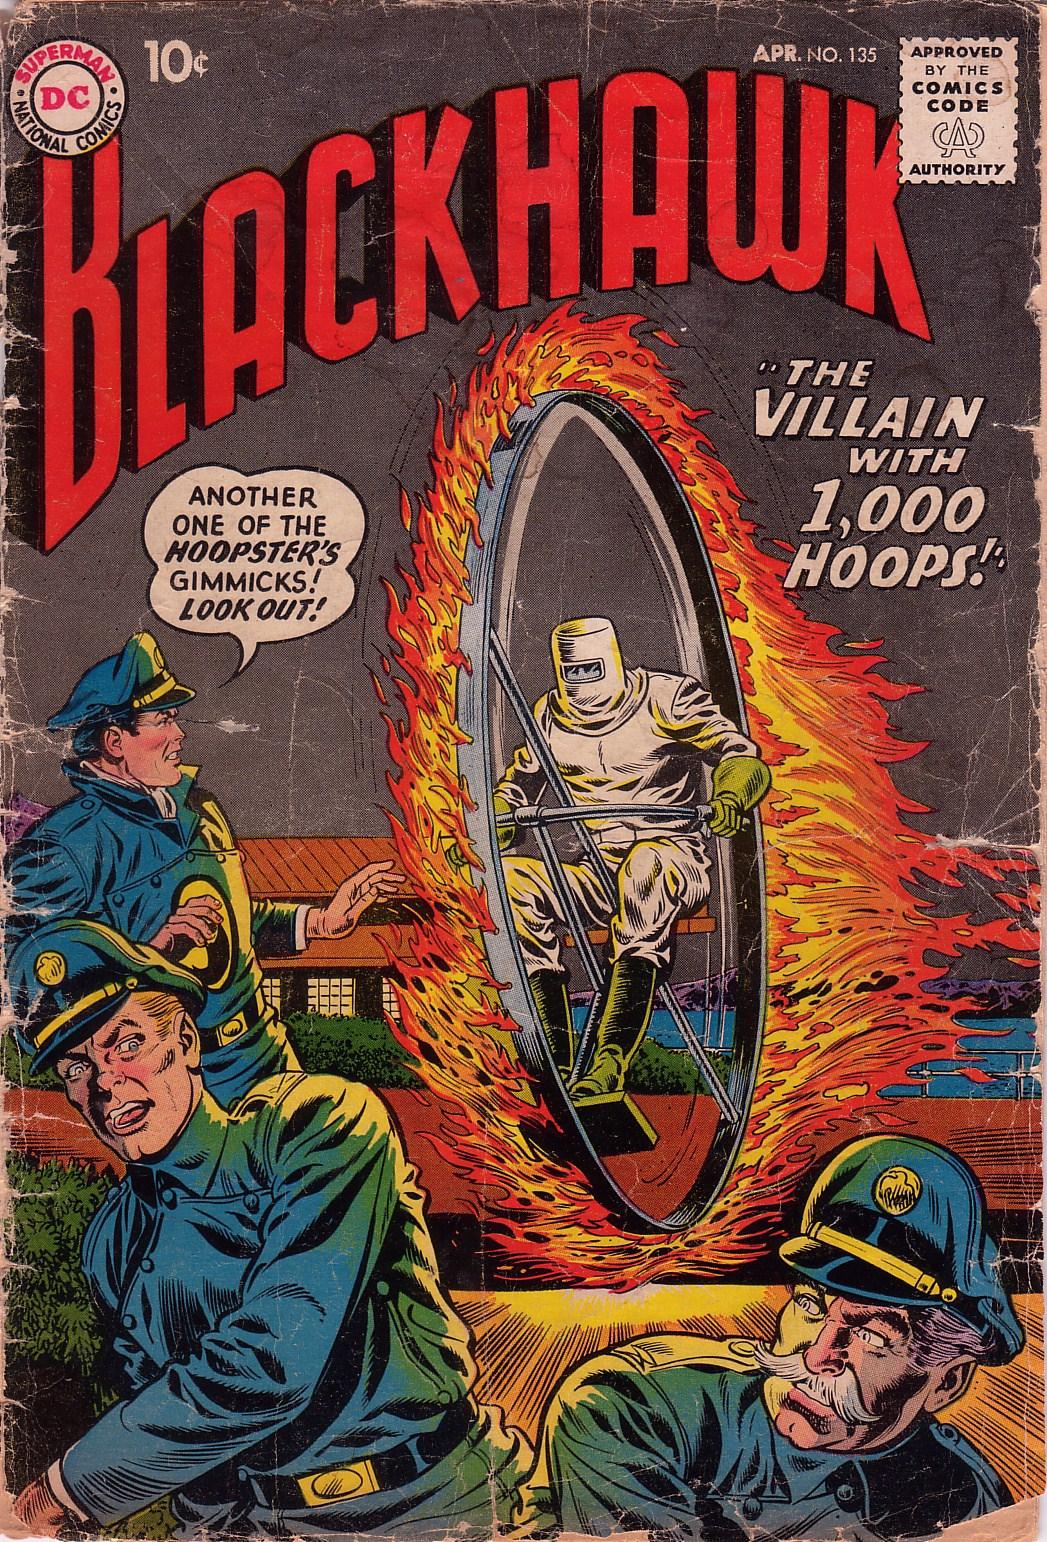 Blackhawk (1957) 135 Page 1